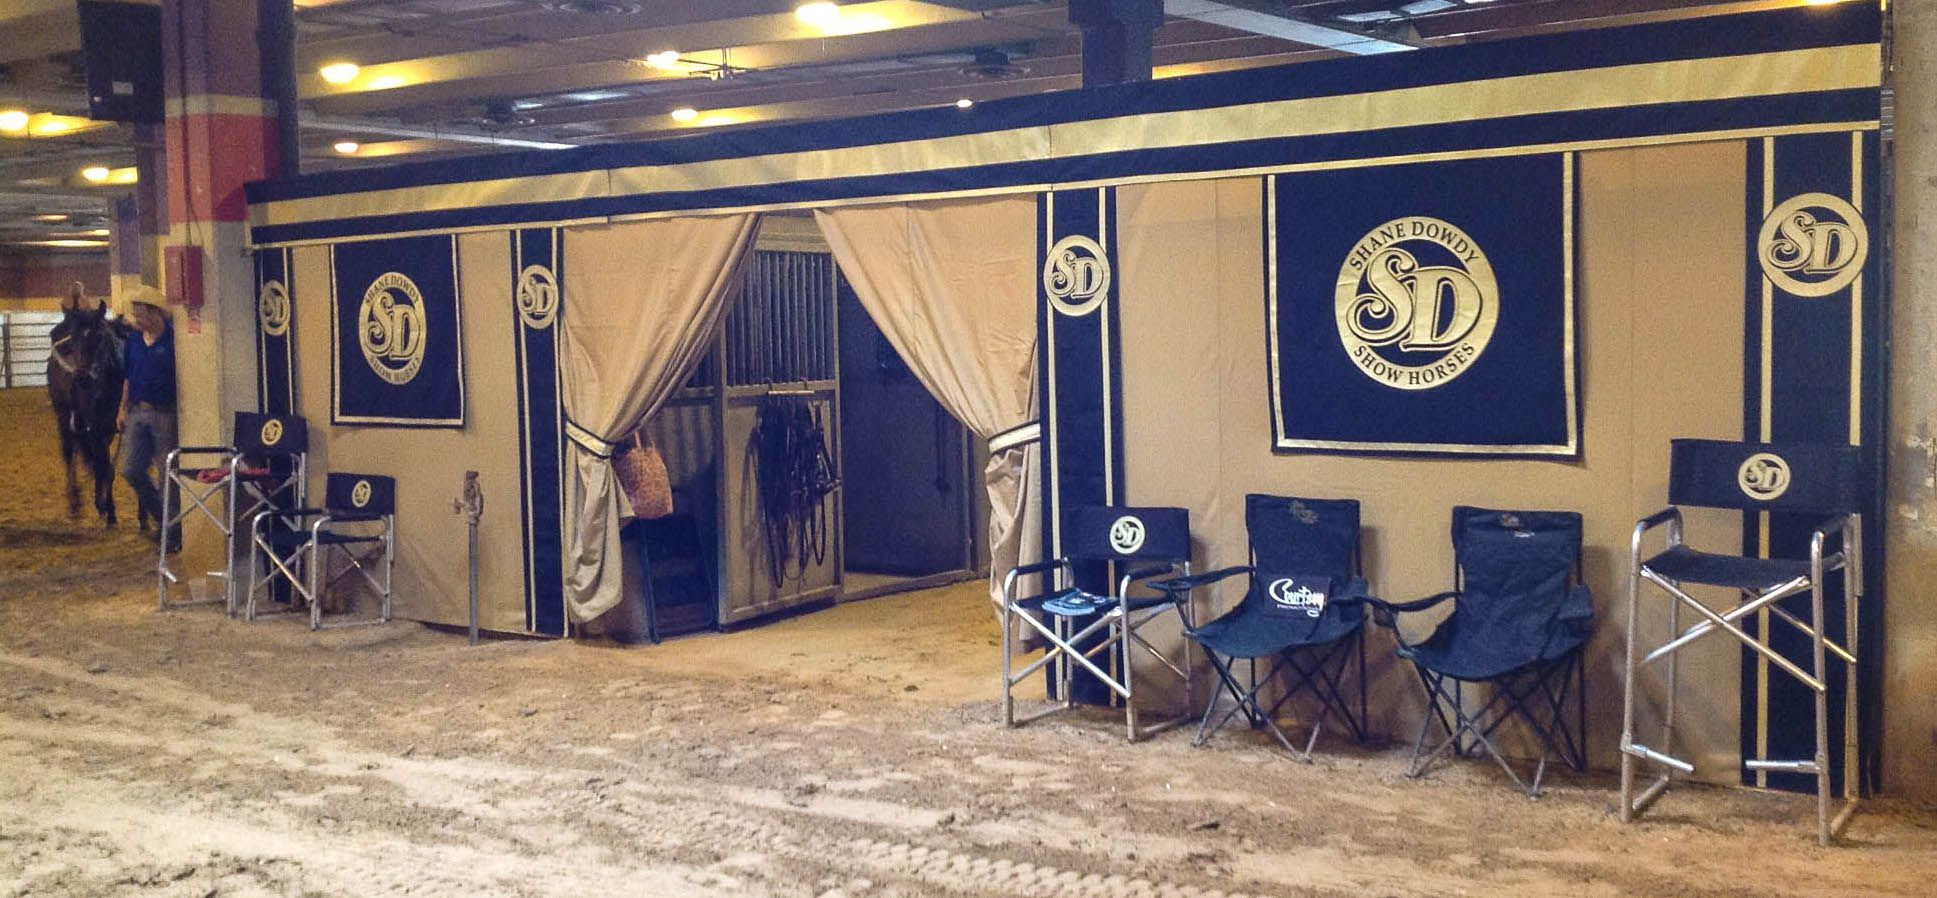 Shane Dowdy Show Horses Horse Stalls Show Horses Horse Stall